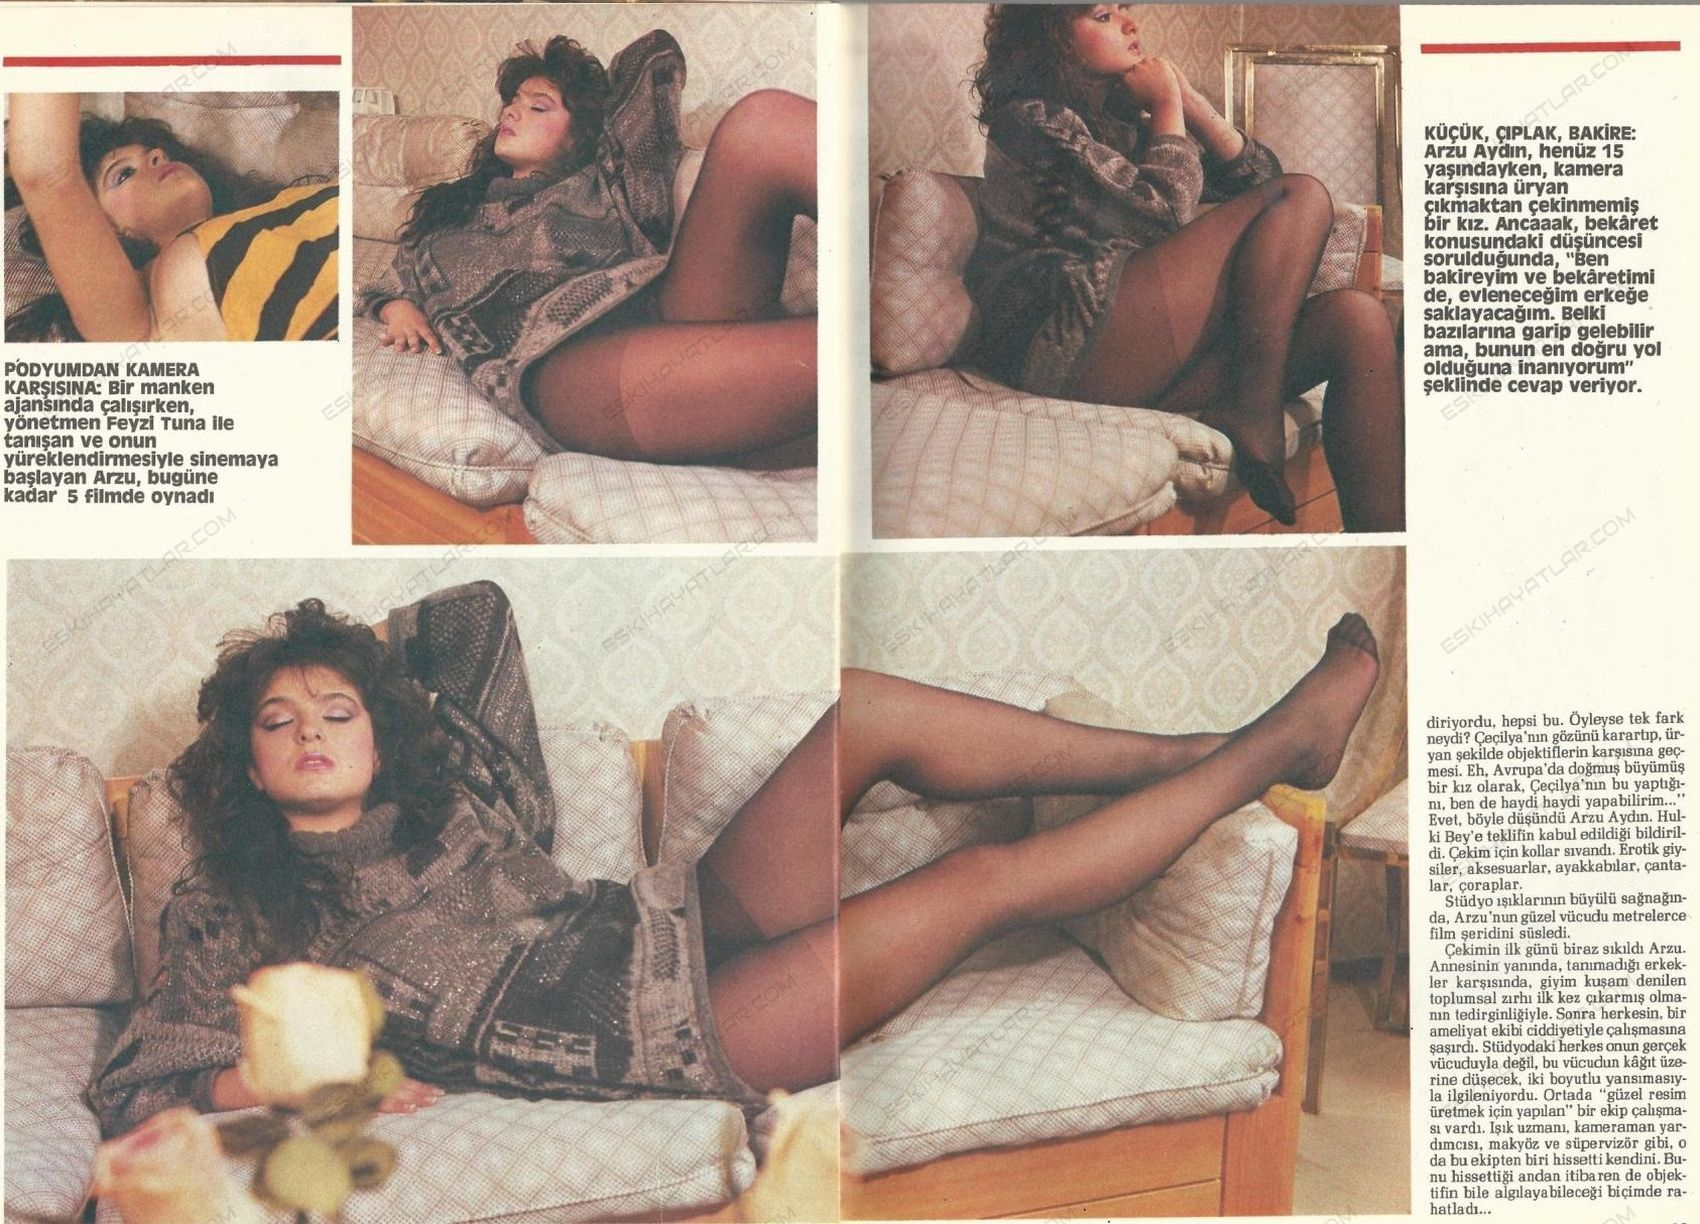 0323-arzu-caglayan-roportaji-1987-erkekce-dergisi (8)